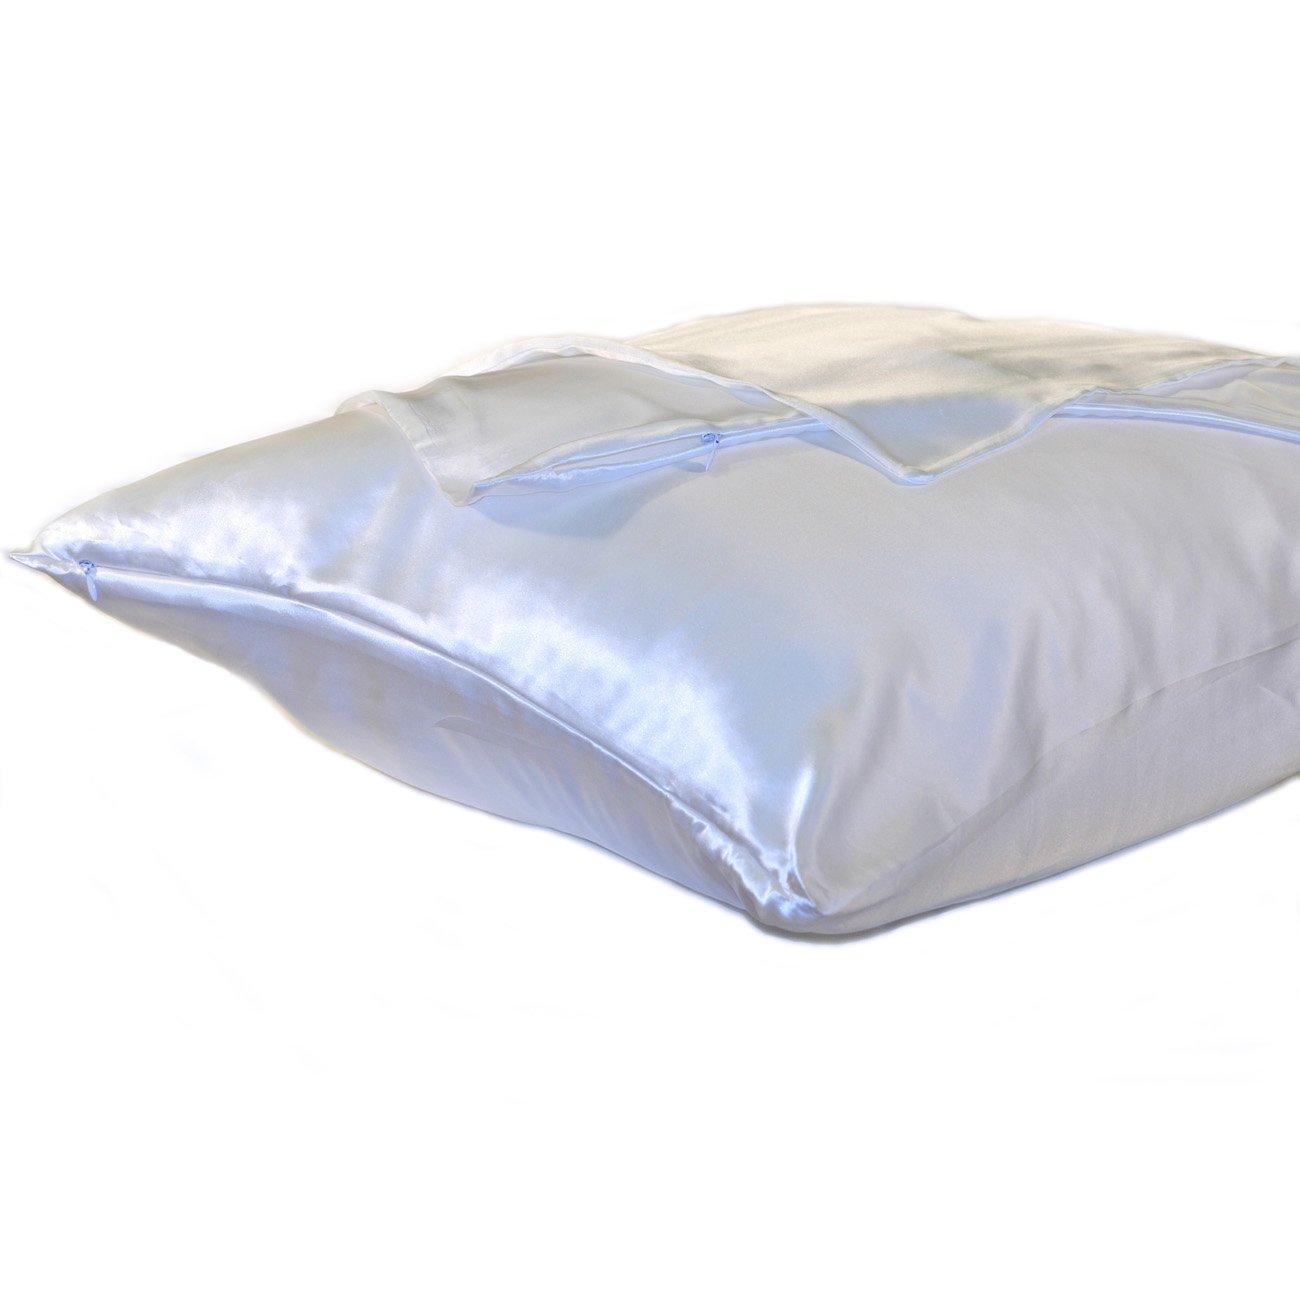 Empress Silk Pillow Protector (1) Standard COMINHKR007558